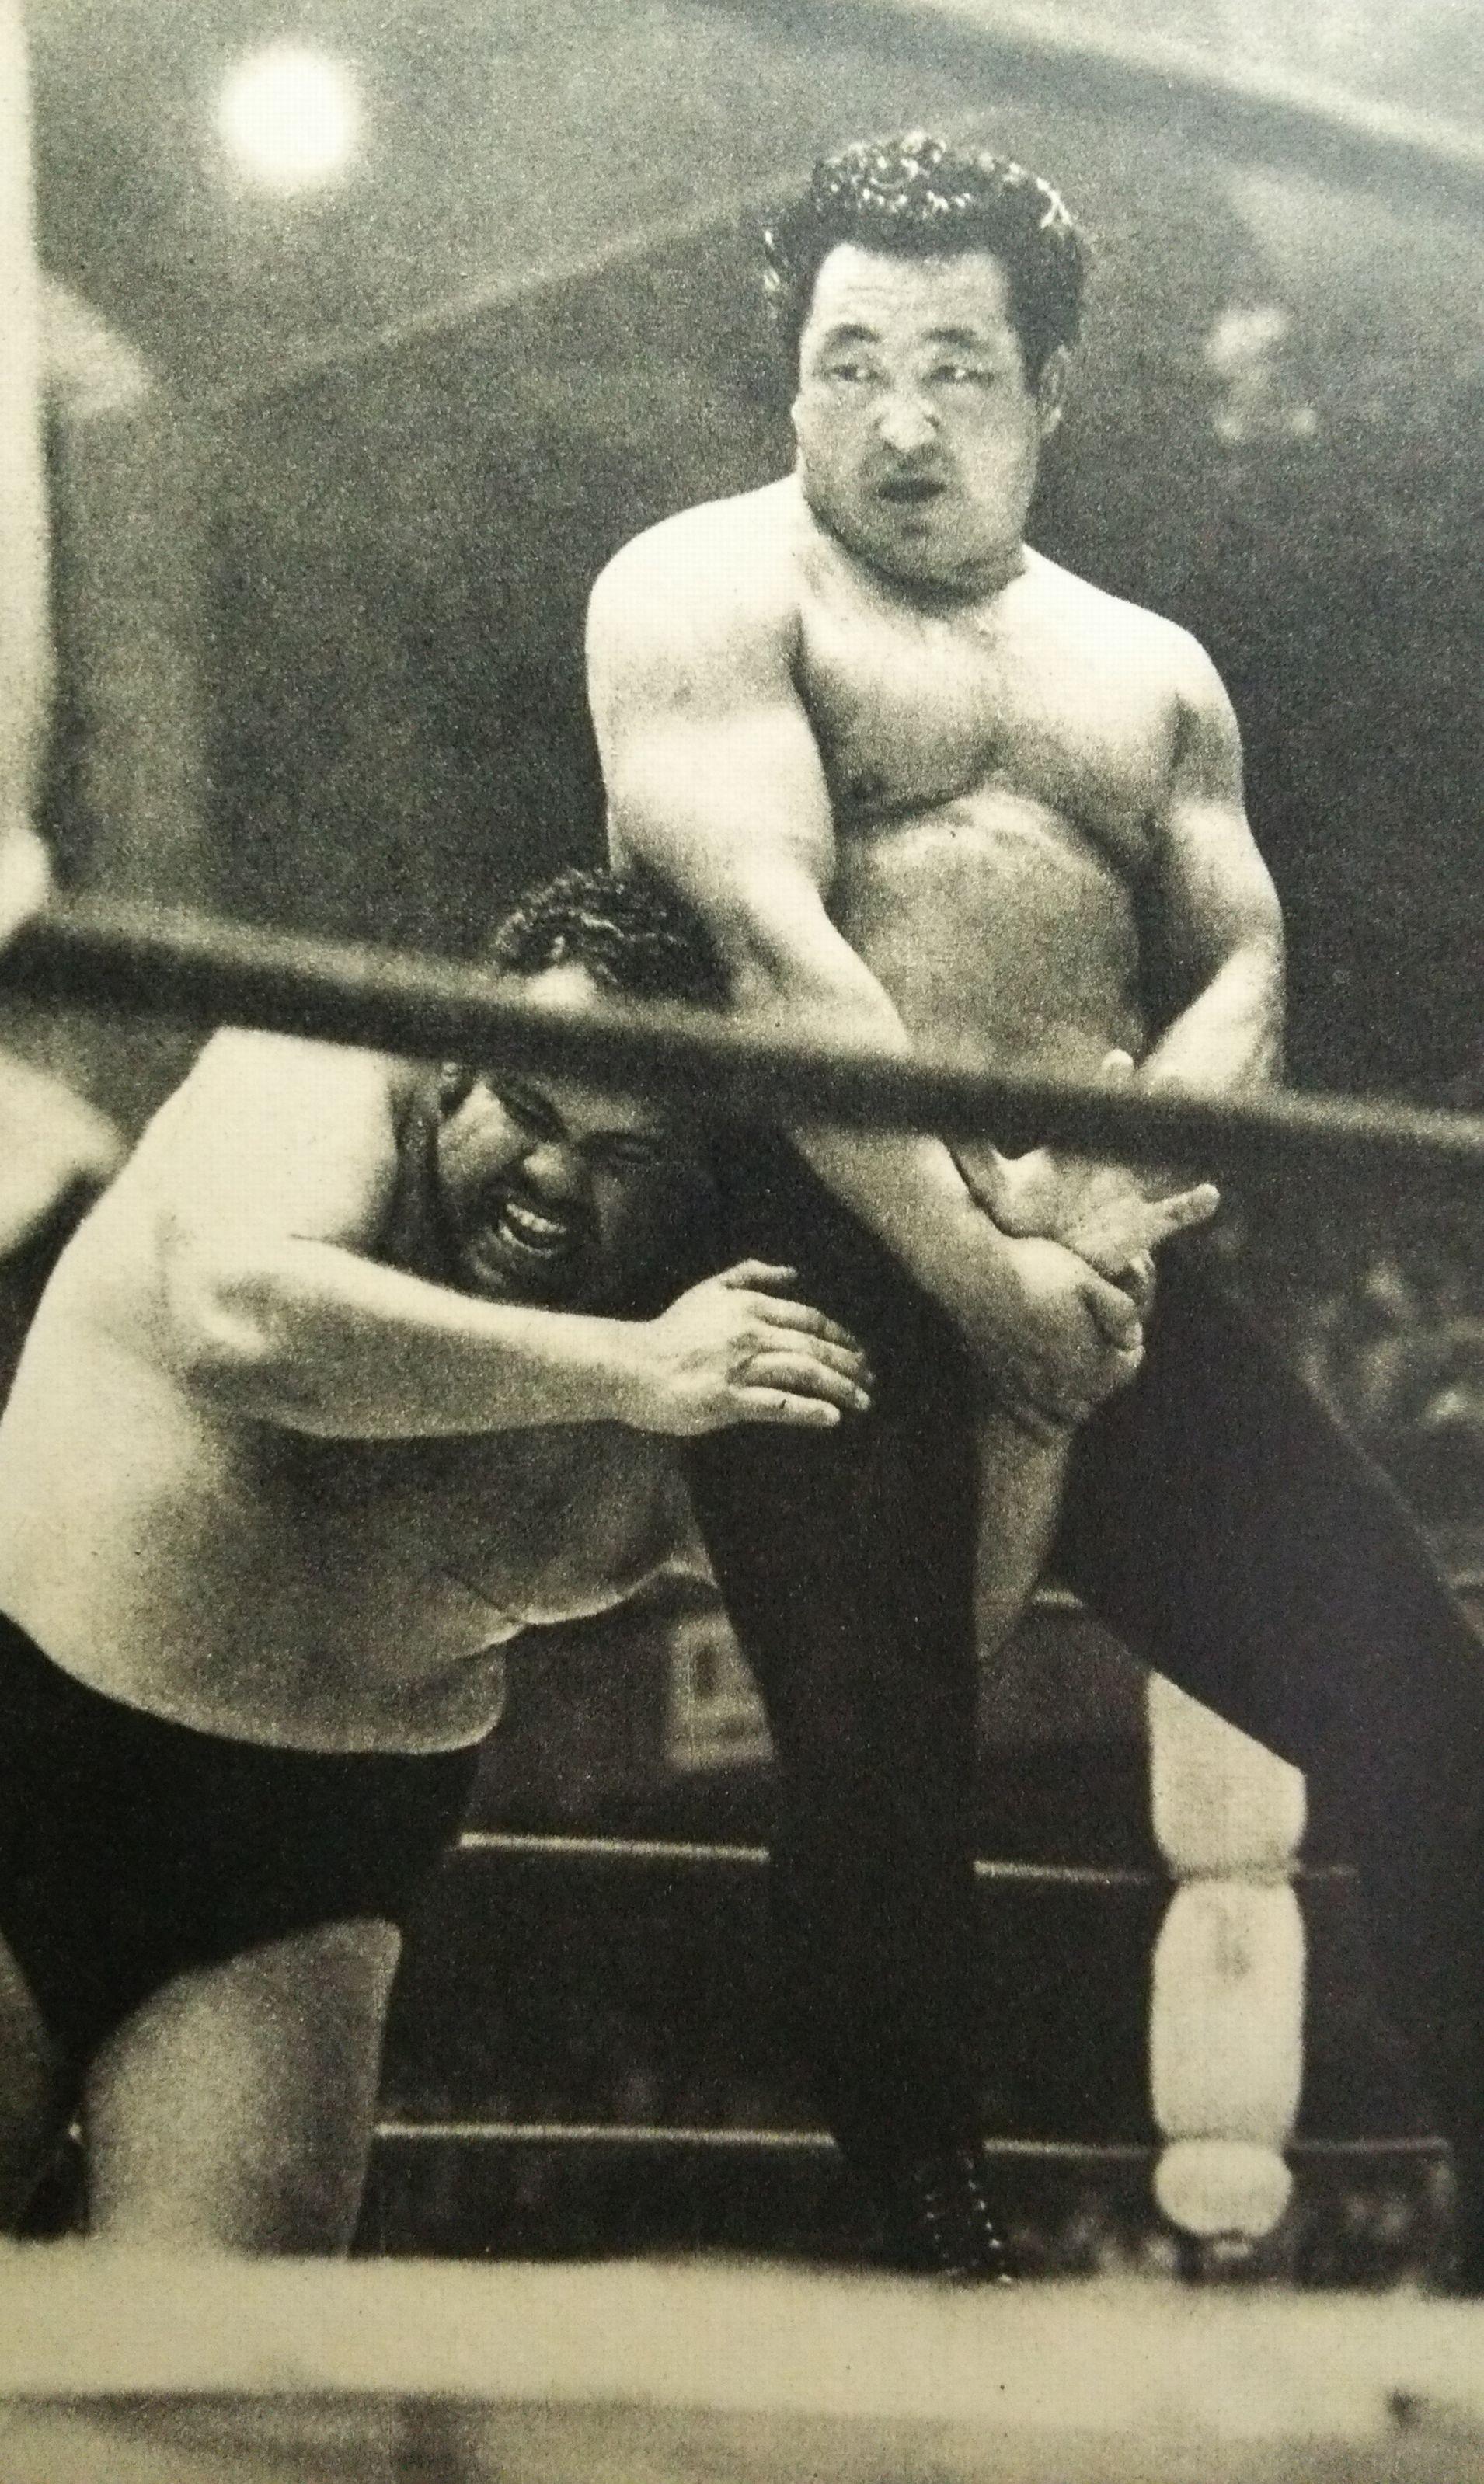 Rikidozan vs american_1955